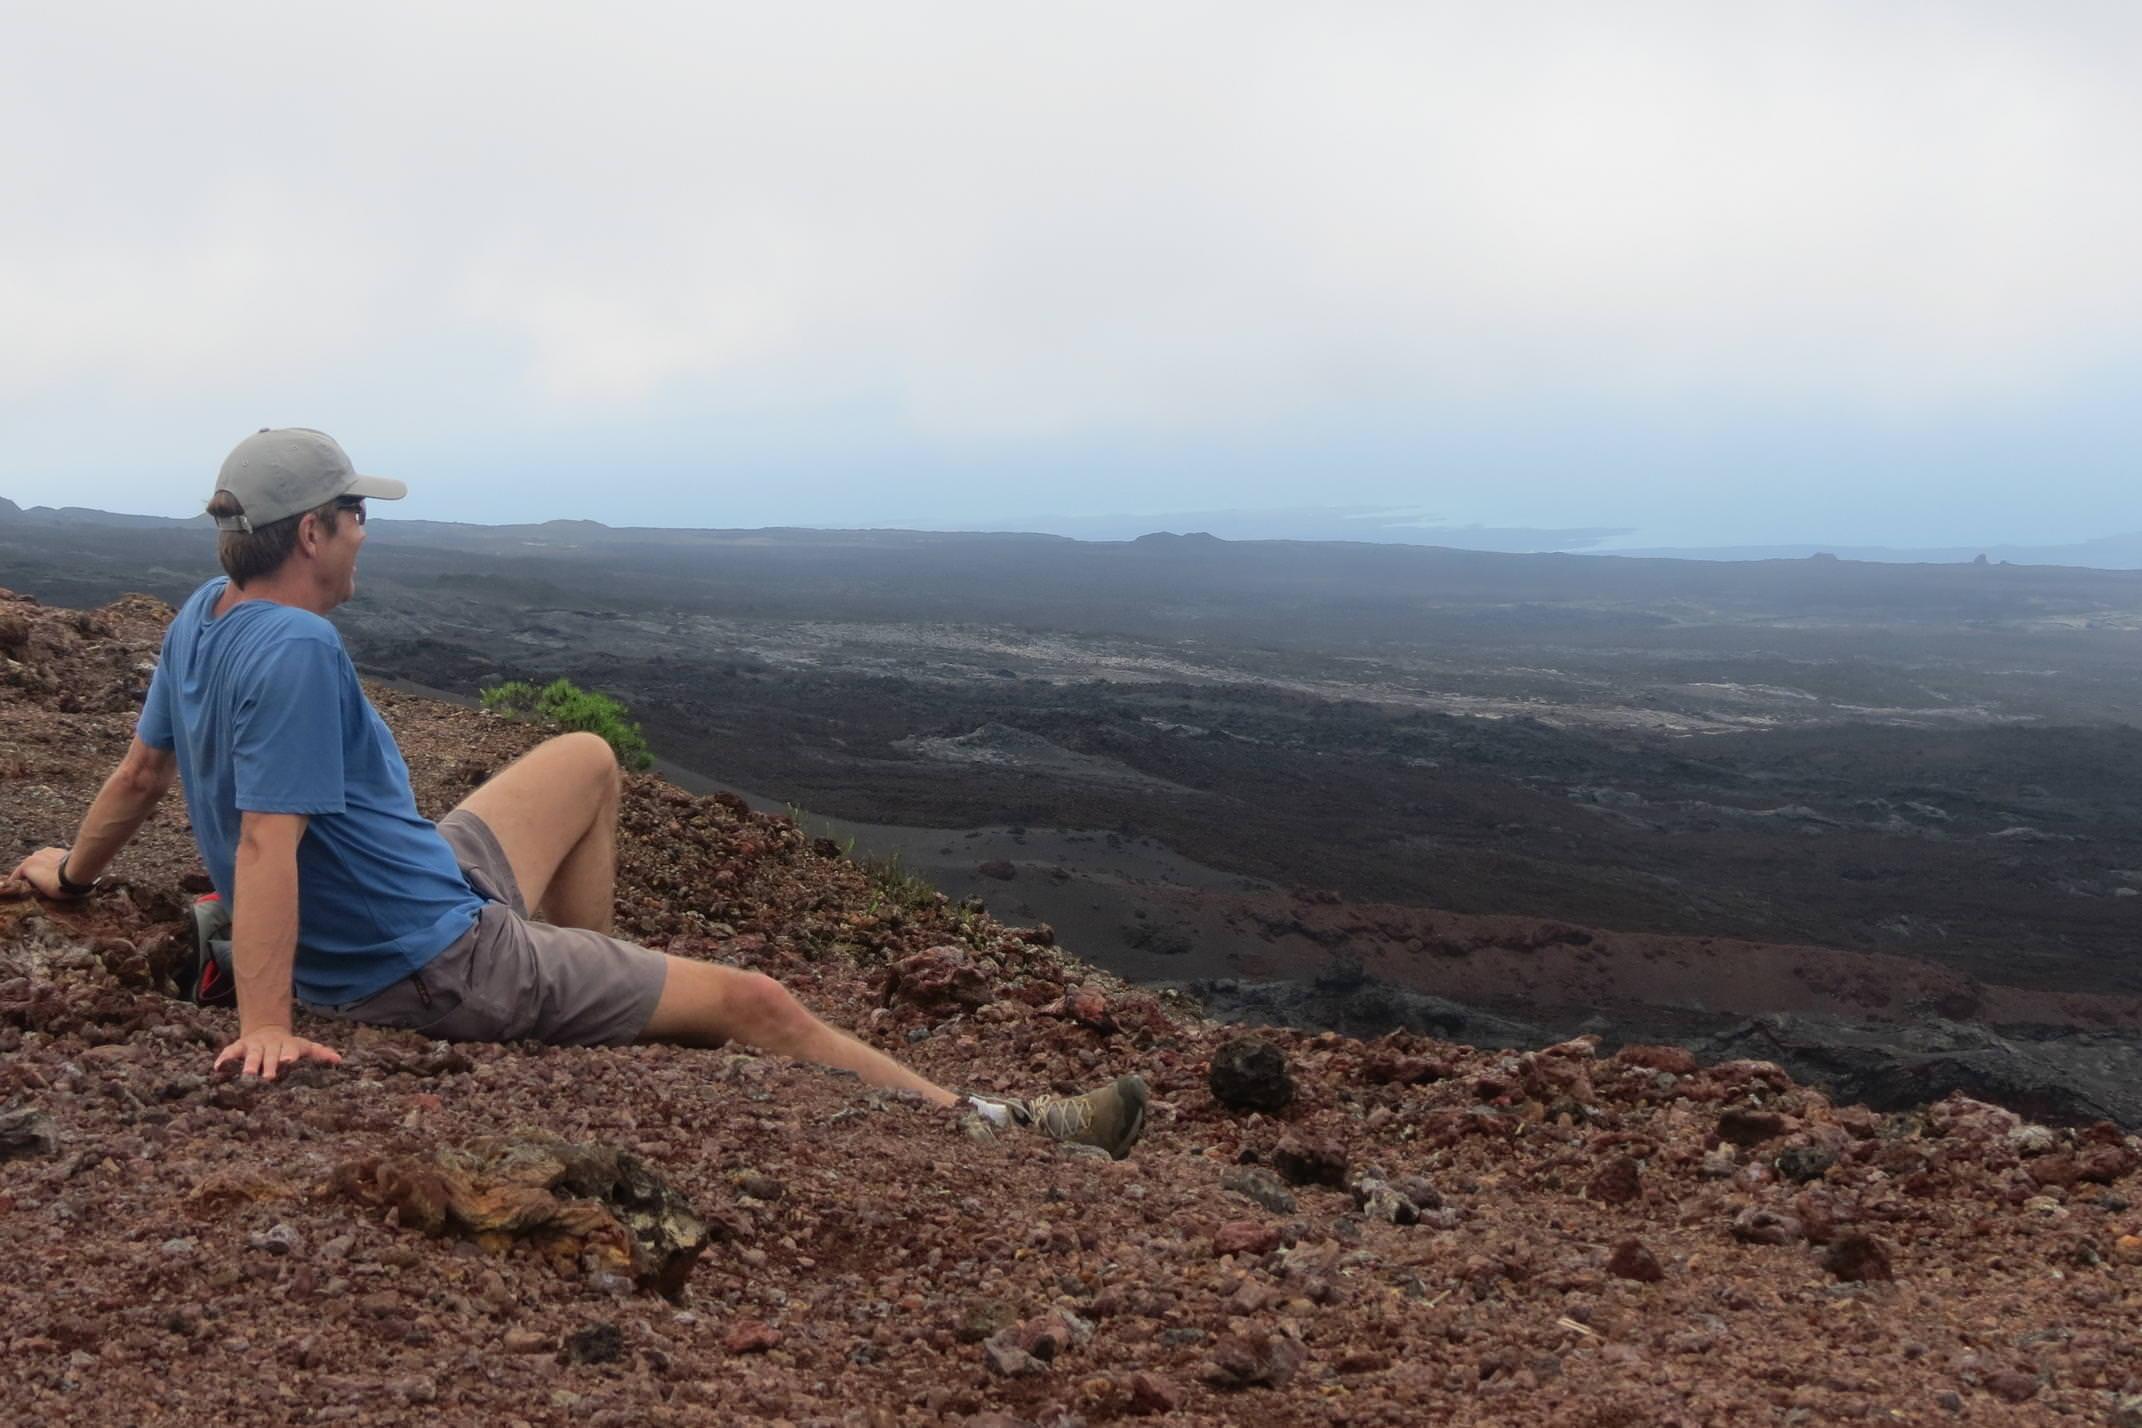 Ecuador galapagos islands isabela cerro negro volcano crater solo man looking out over lava field